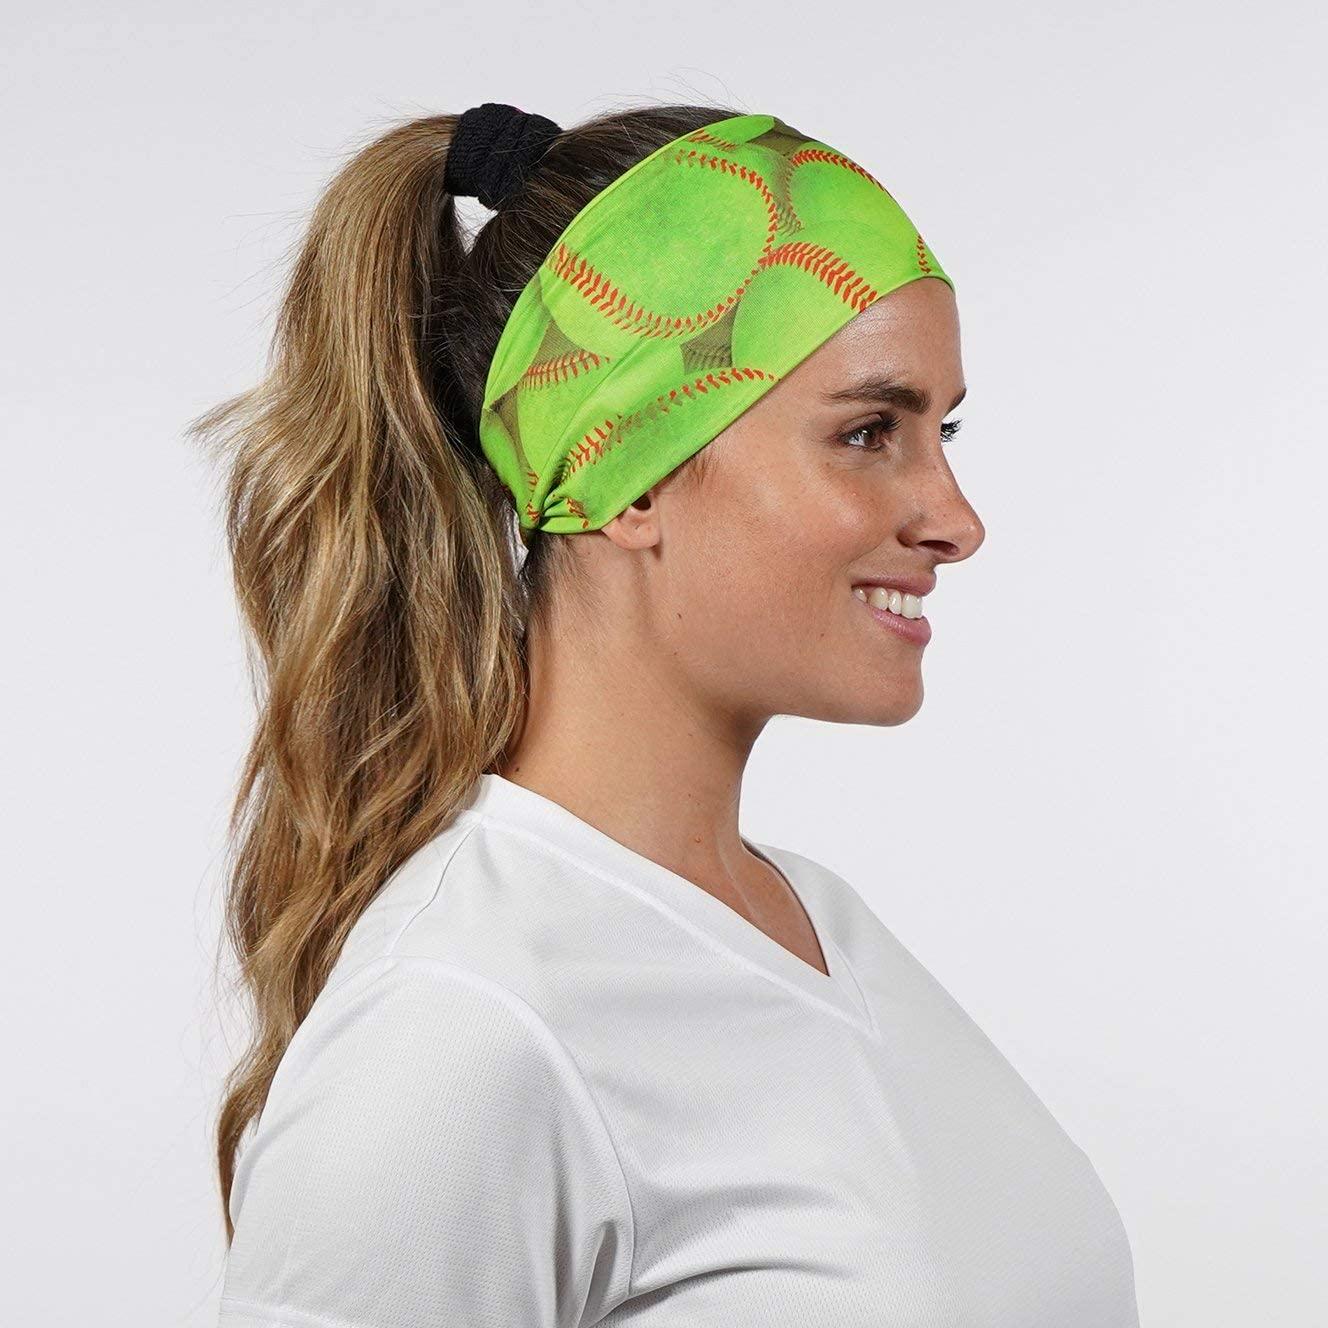 SLEEFS Softballs Headband